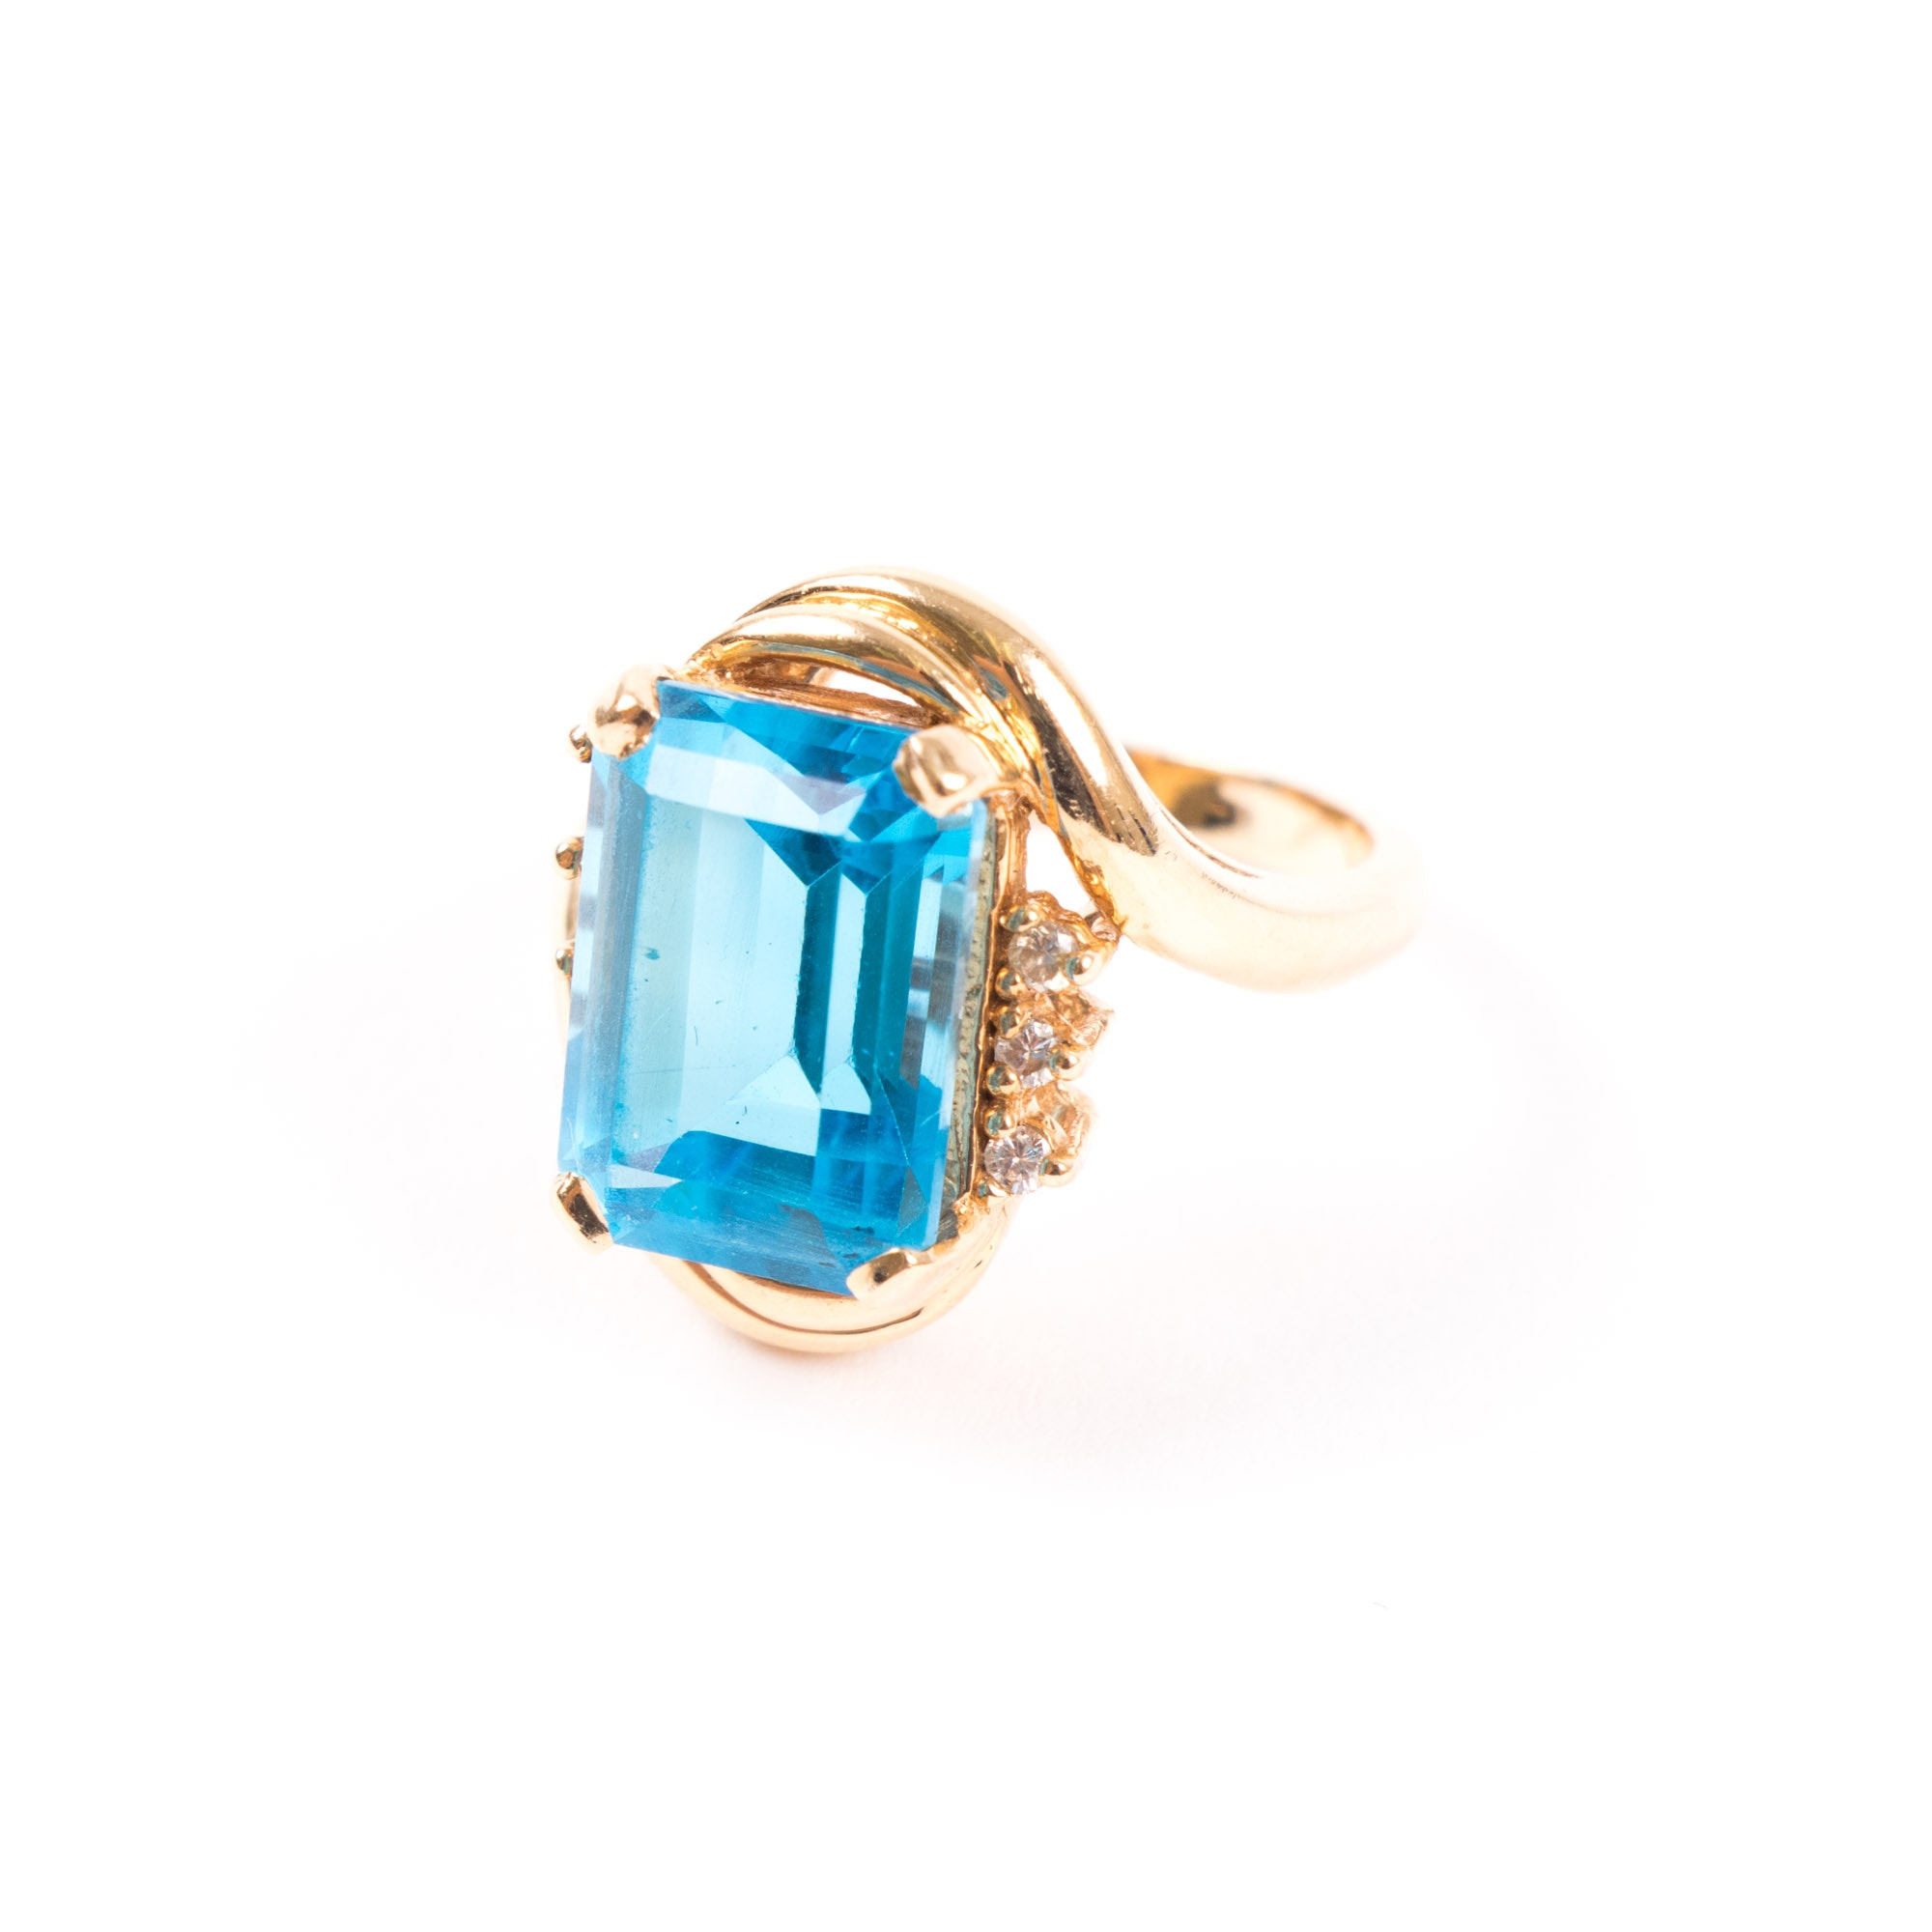 14K Yellow Gold, Topaz, and Diamond Ring